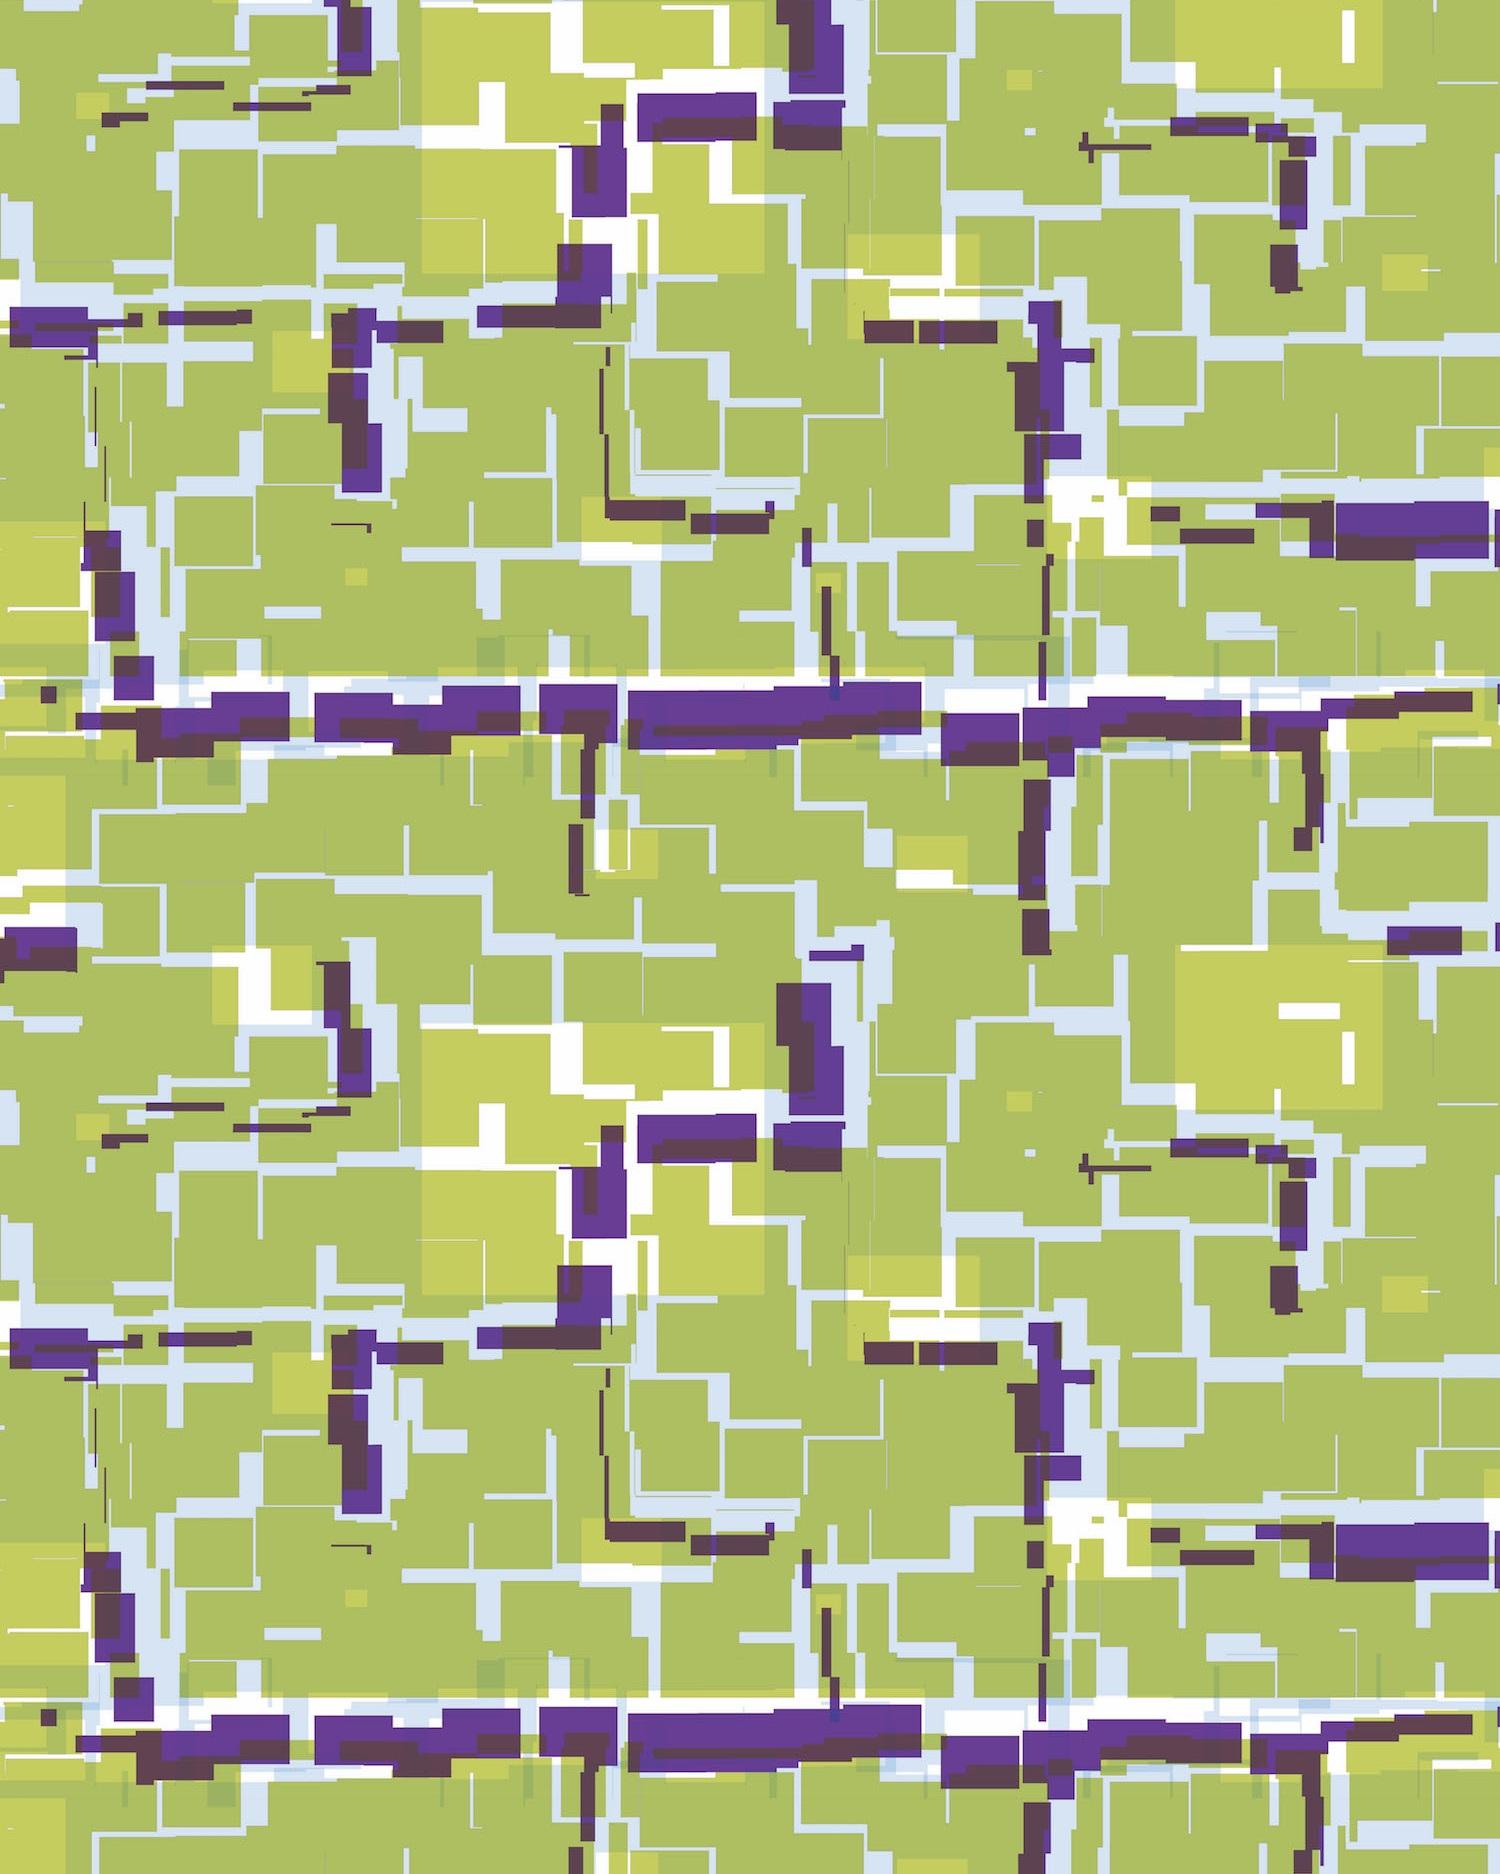 jadesign-hyper-09.jpg